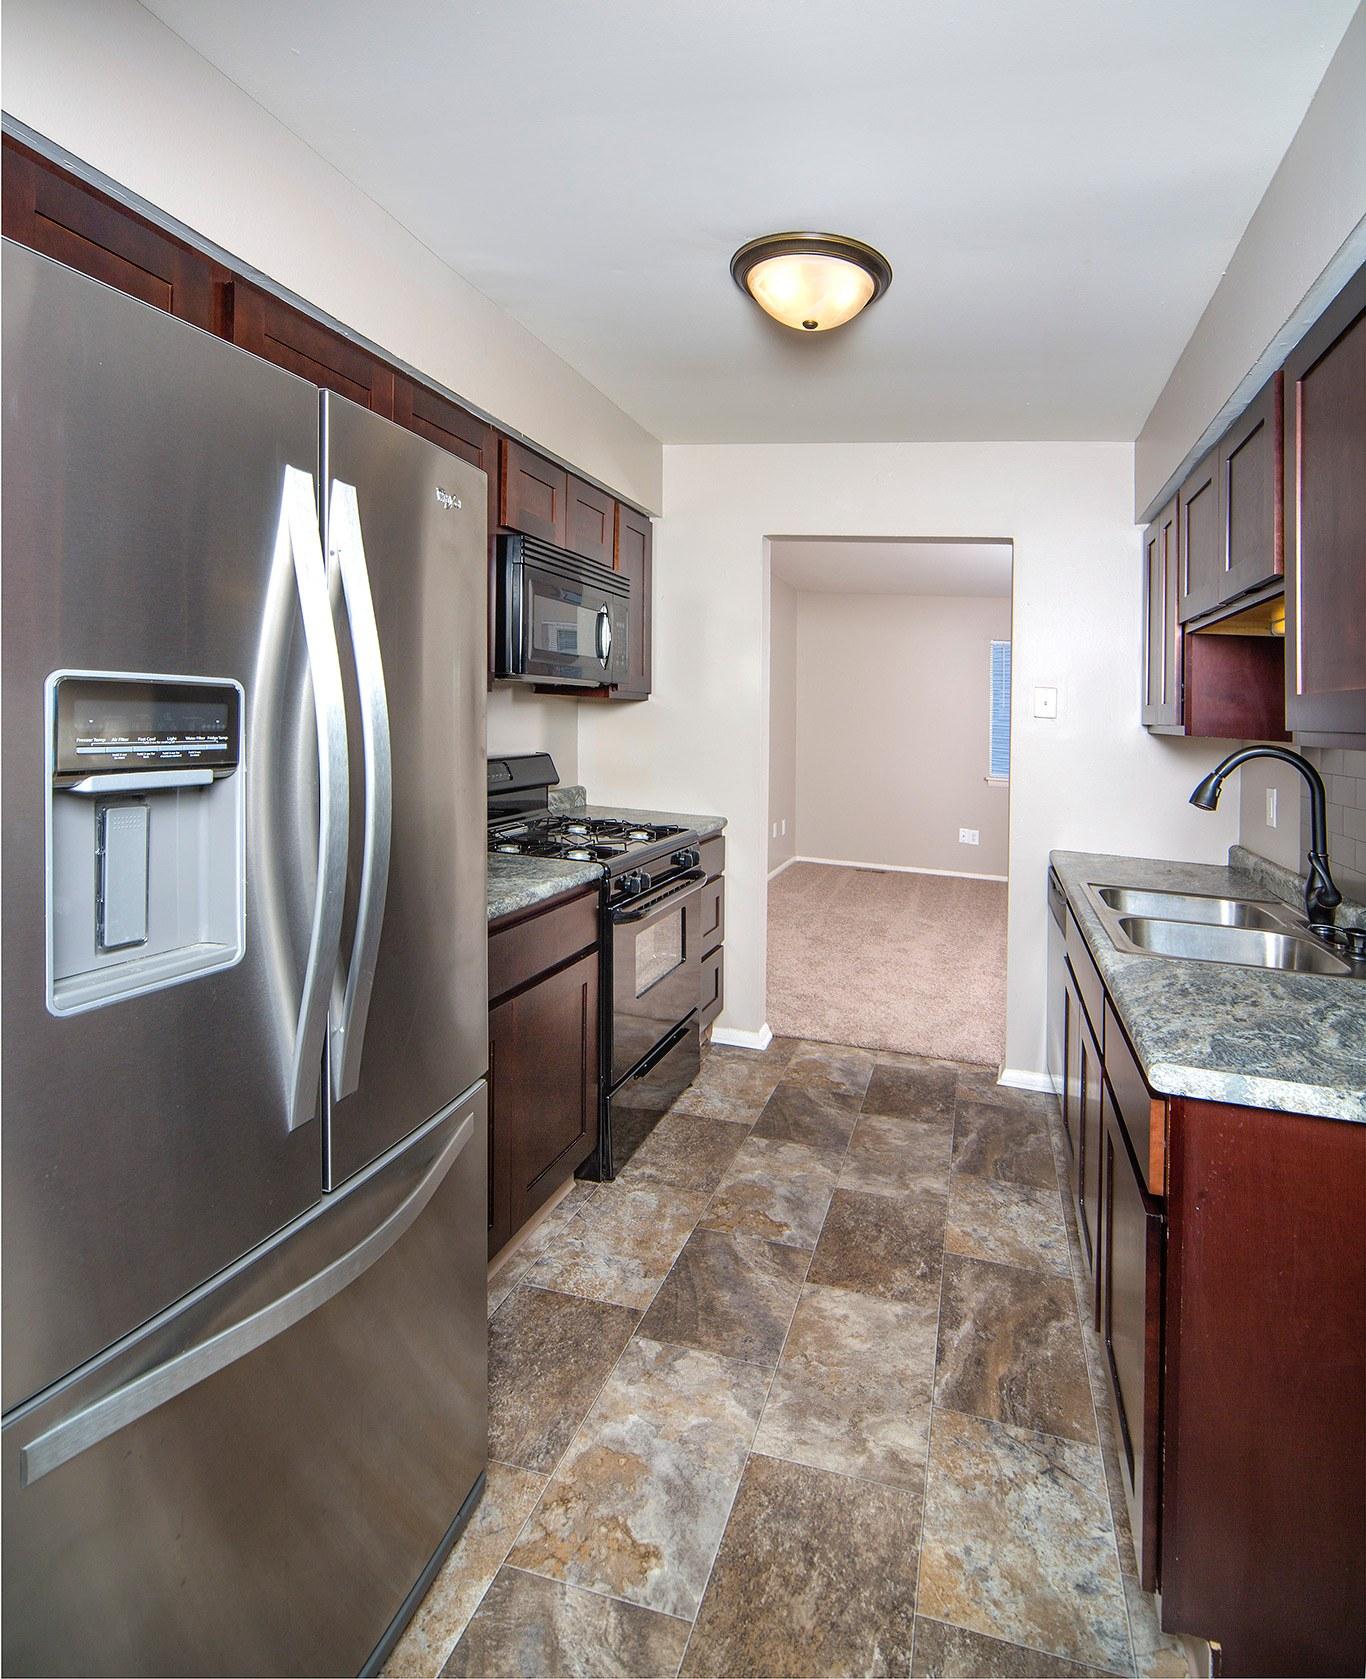 Grand Rapids, Michigan Apartments - The